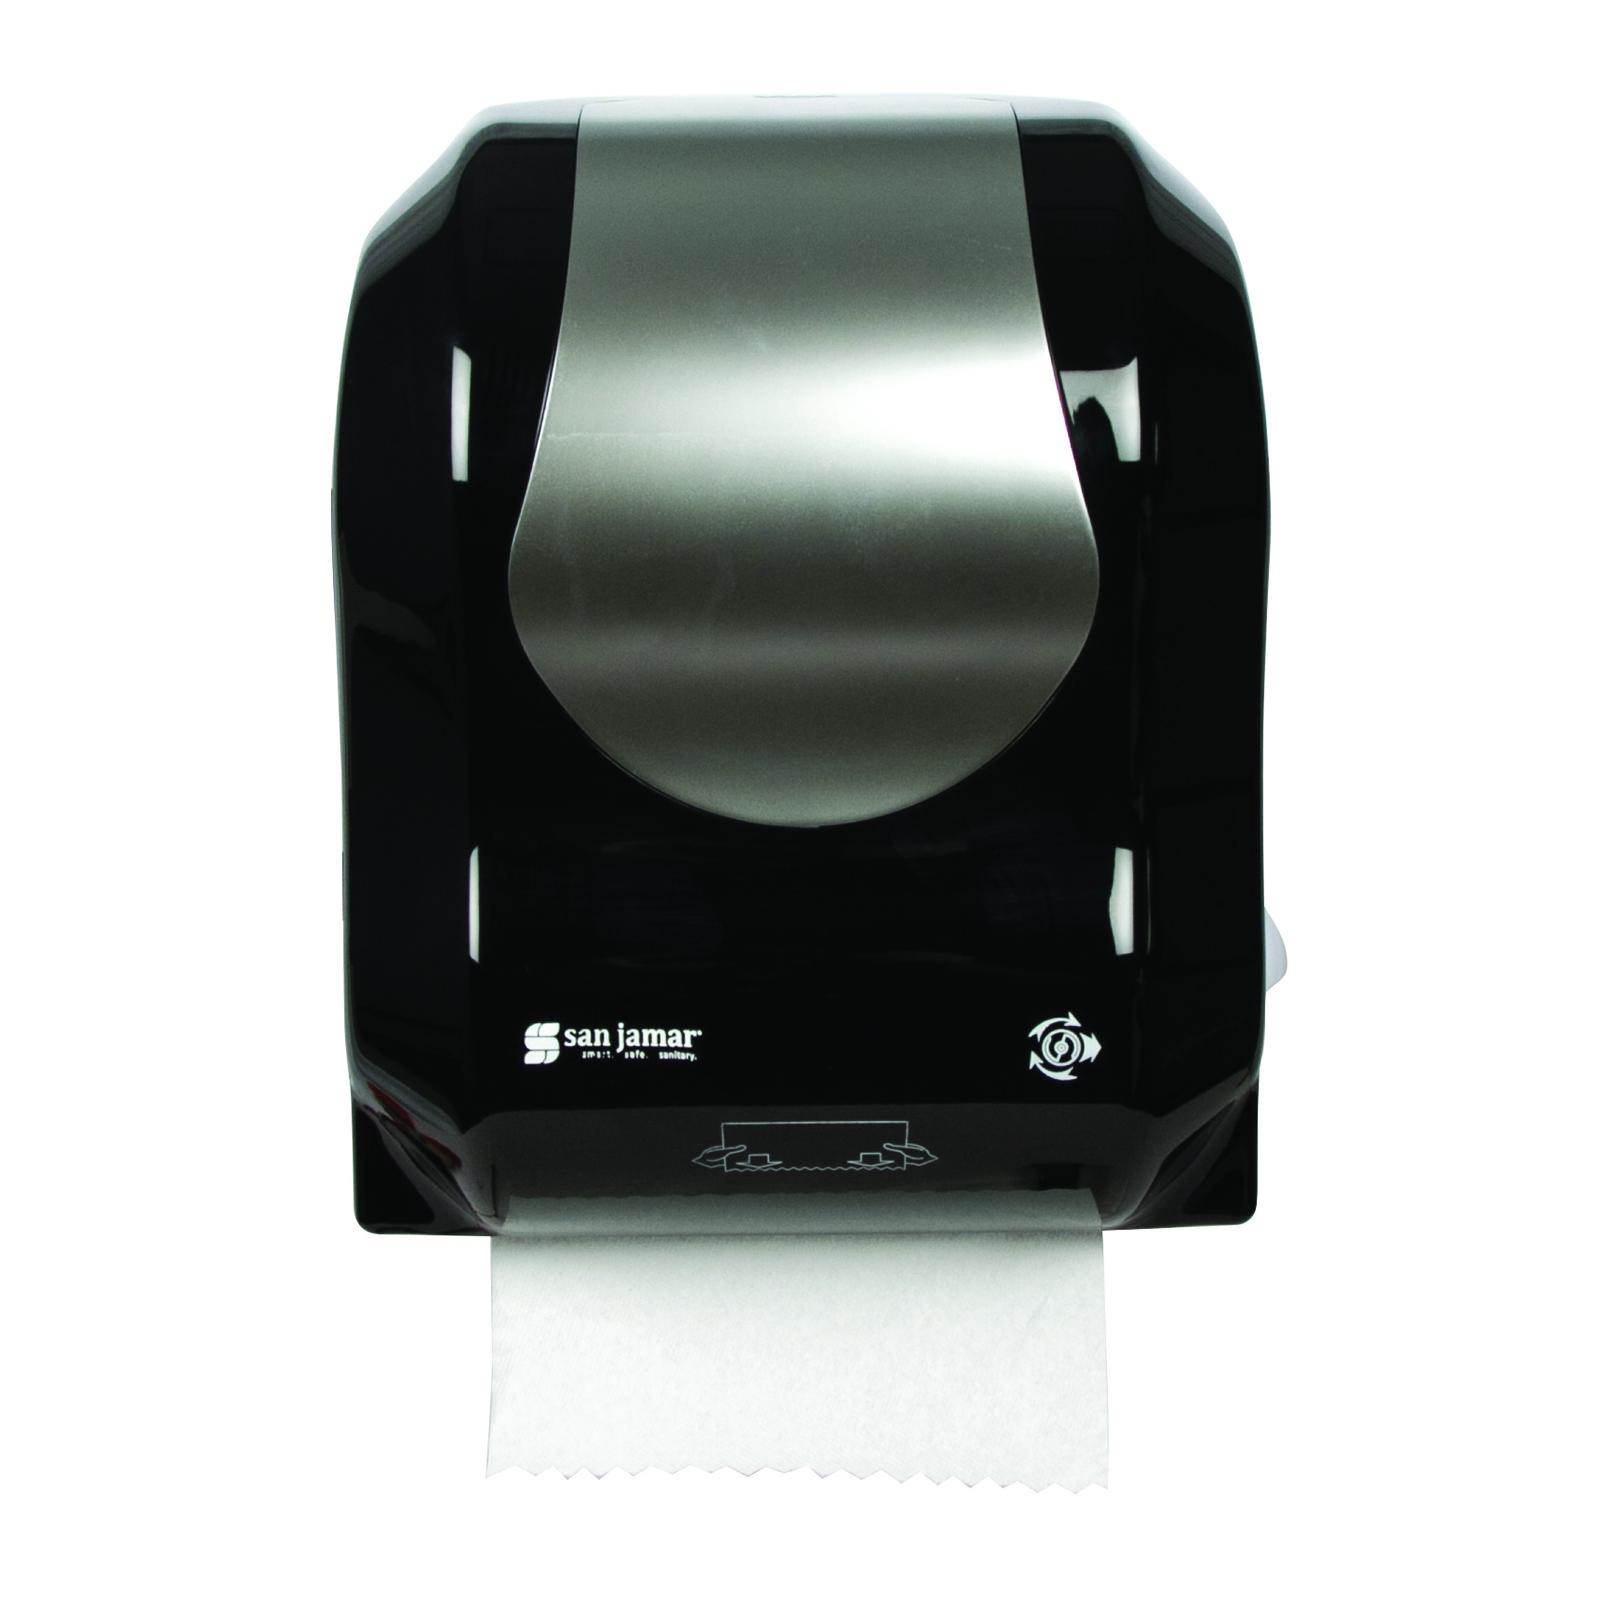 San Jamar T7470BKSS paper towel dispenser